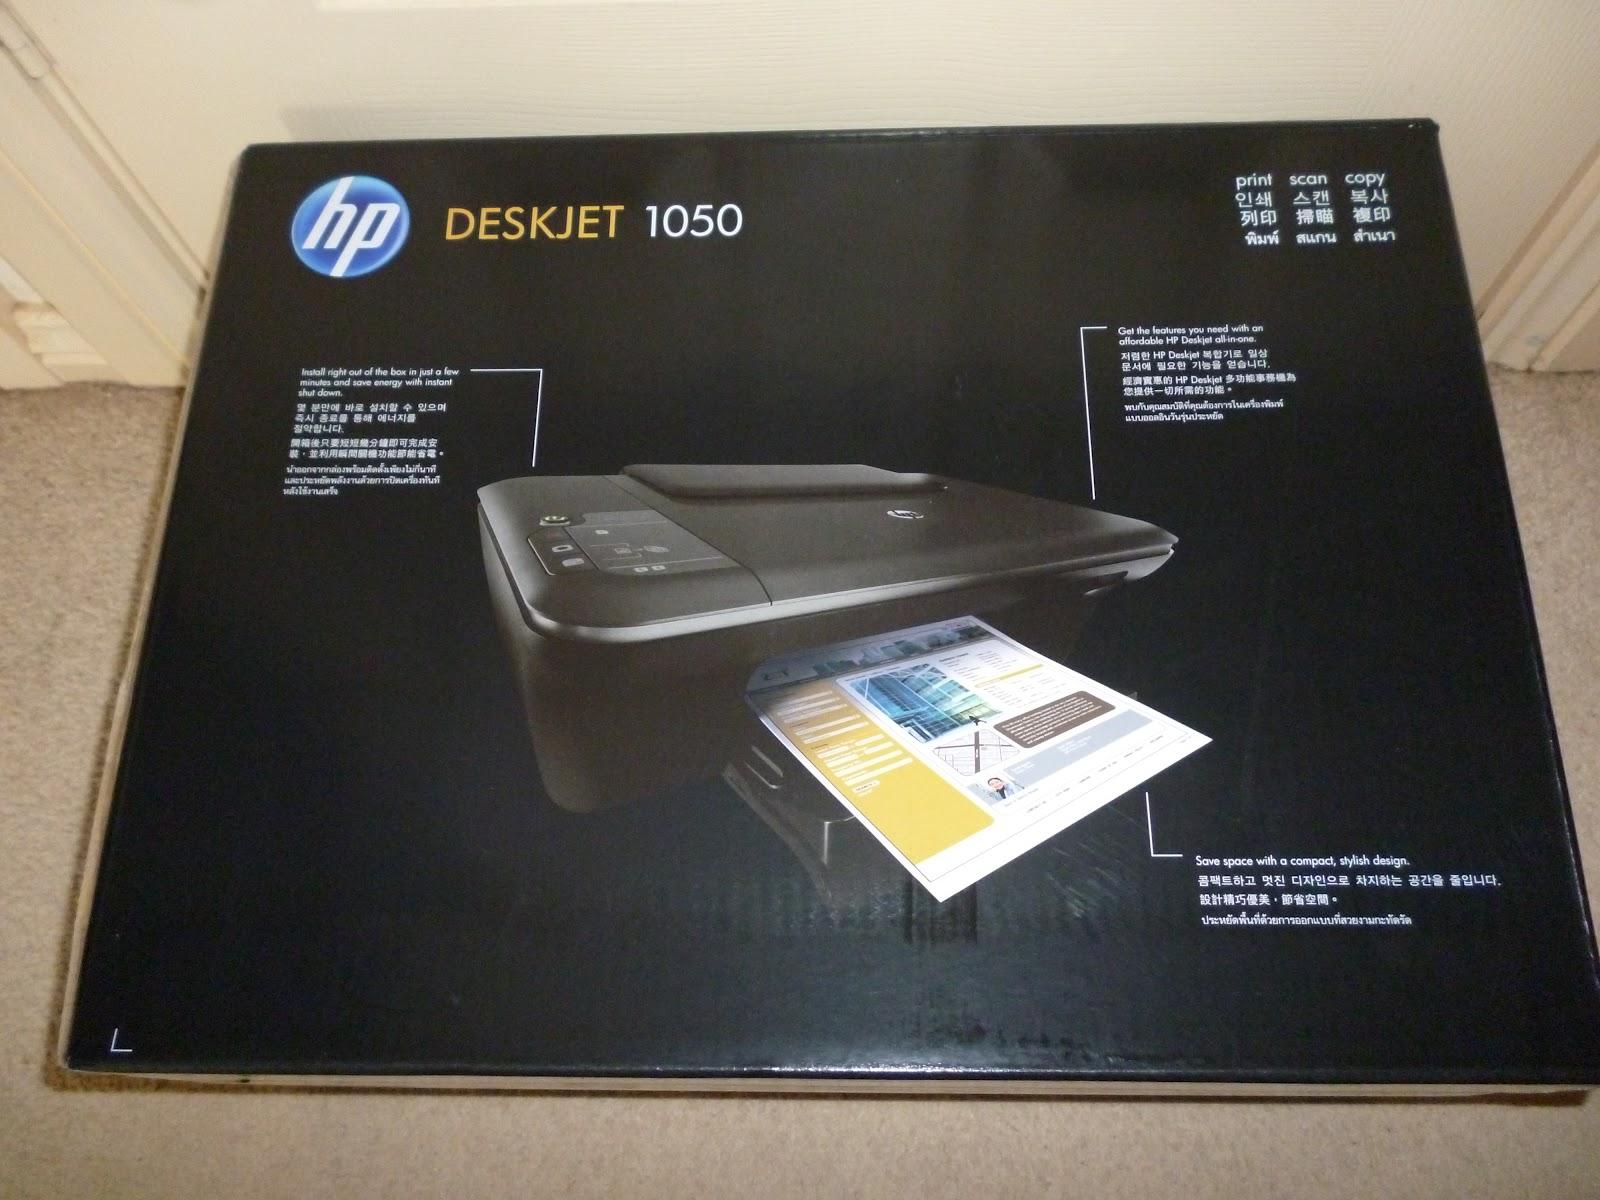 hp deskjet 1050 all in one j410 series download for windows 10